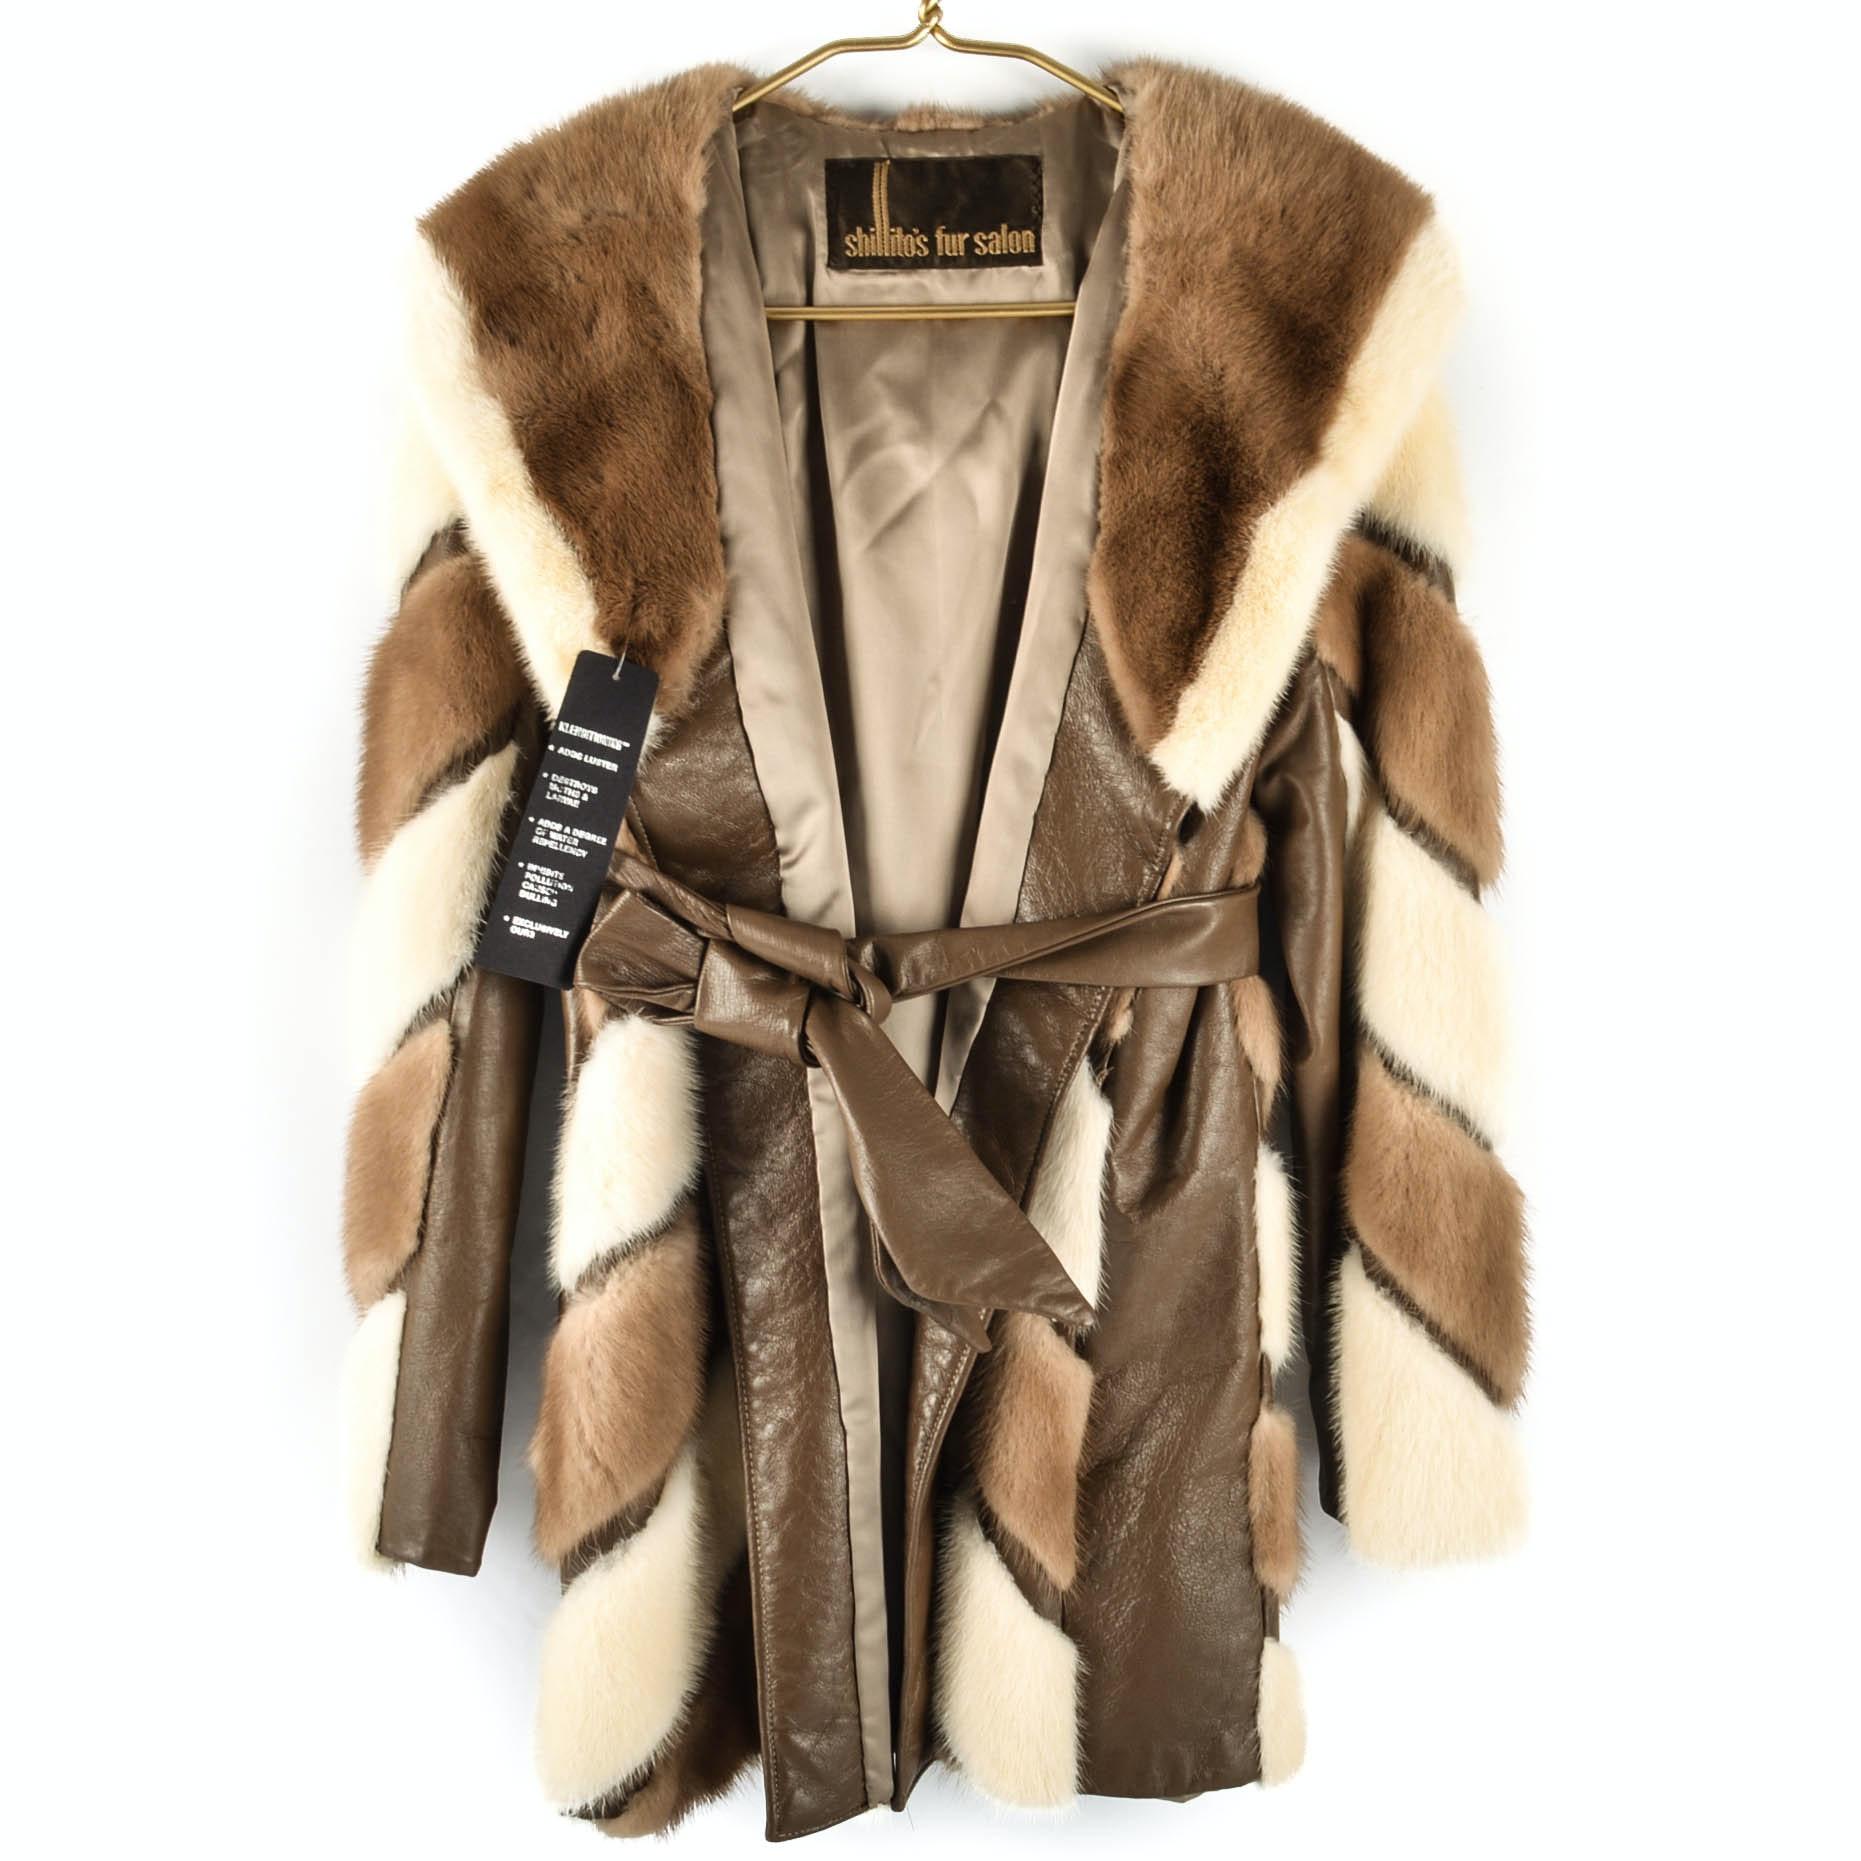 1960s-1970s Shillito's Fur Salon Mink and Leather Women's Coat